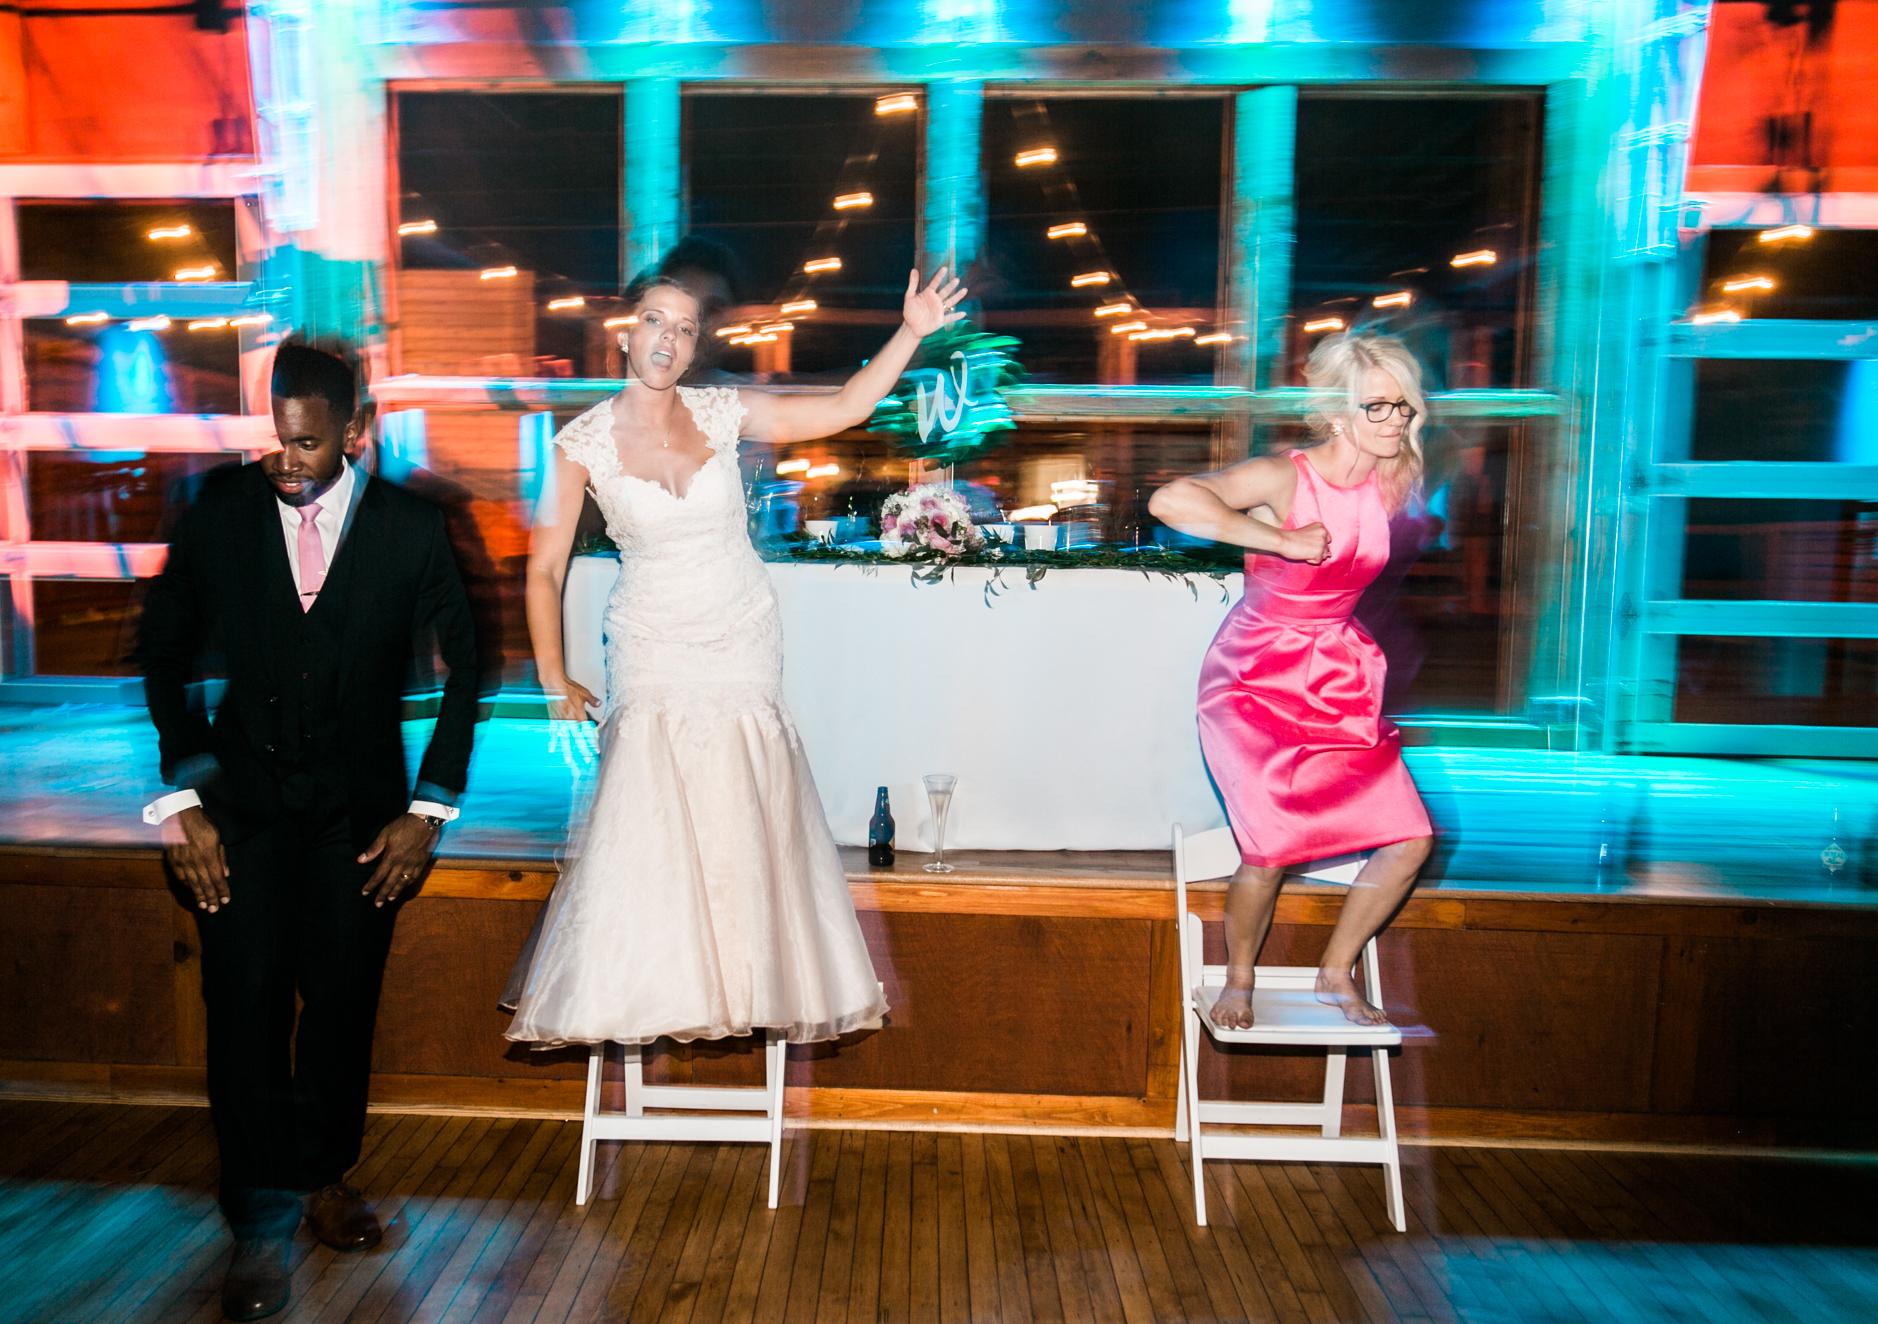 LegacyUnion-Wedding-Photographer-Glendale-CA-79.jpg